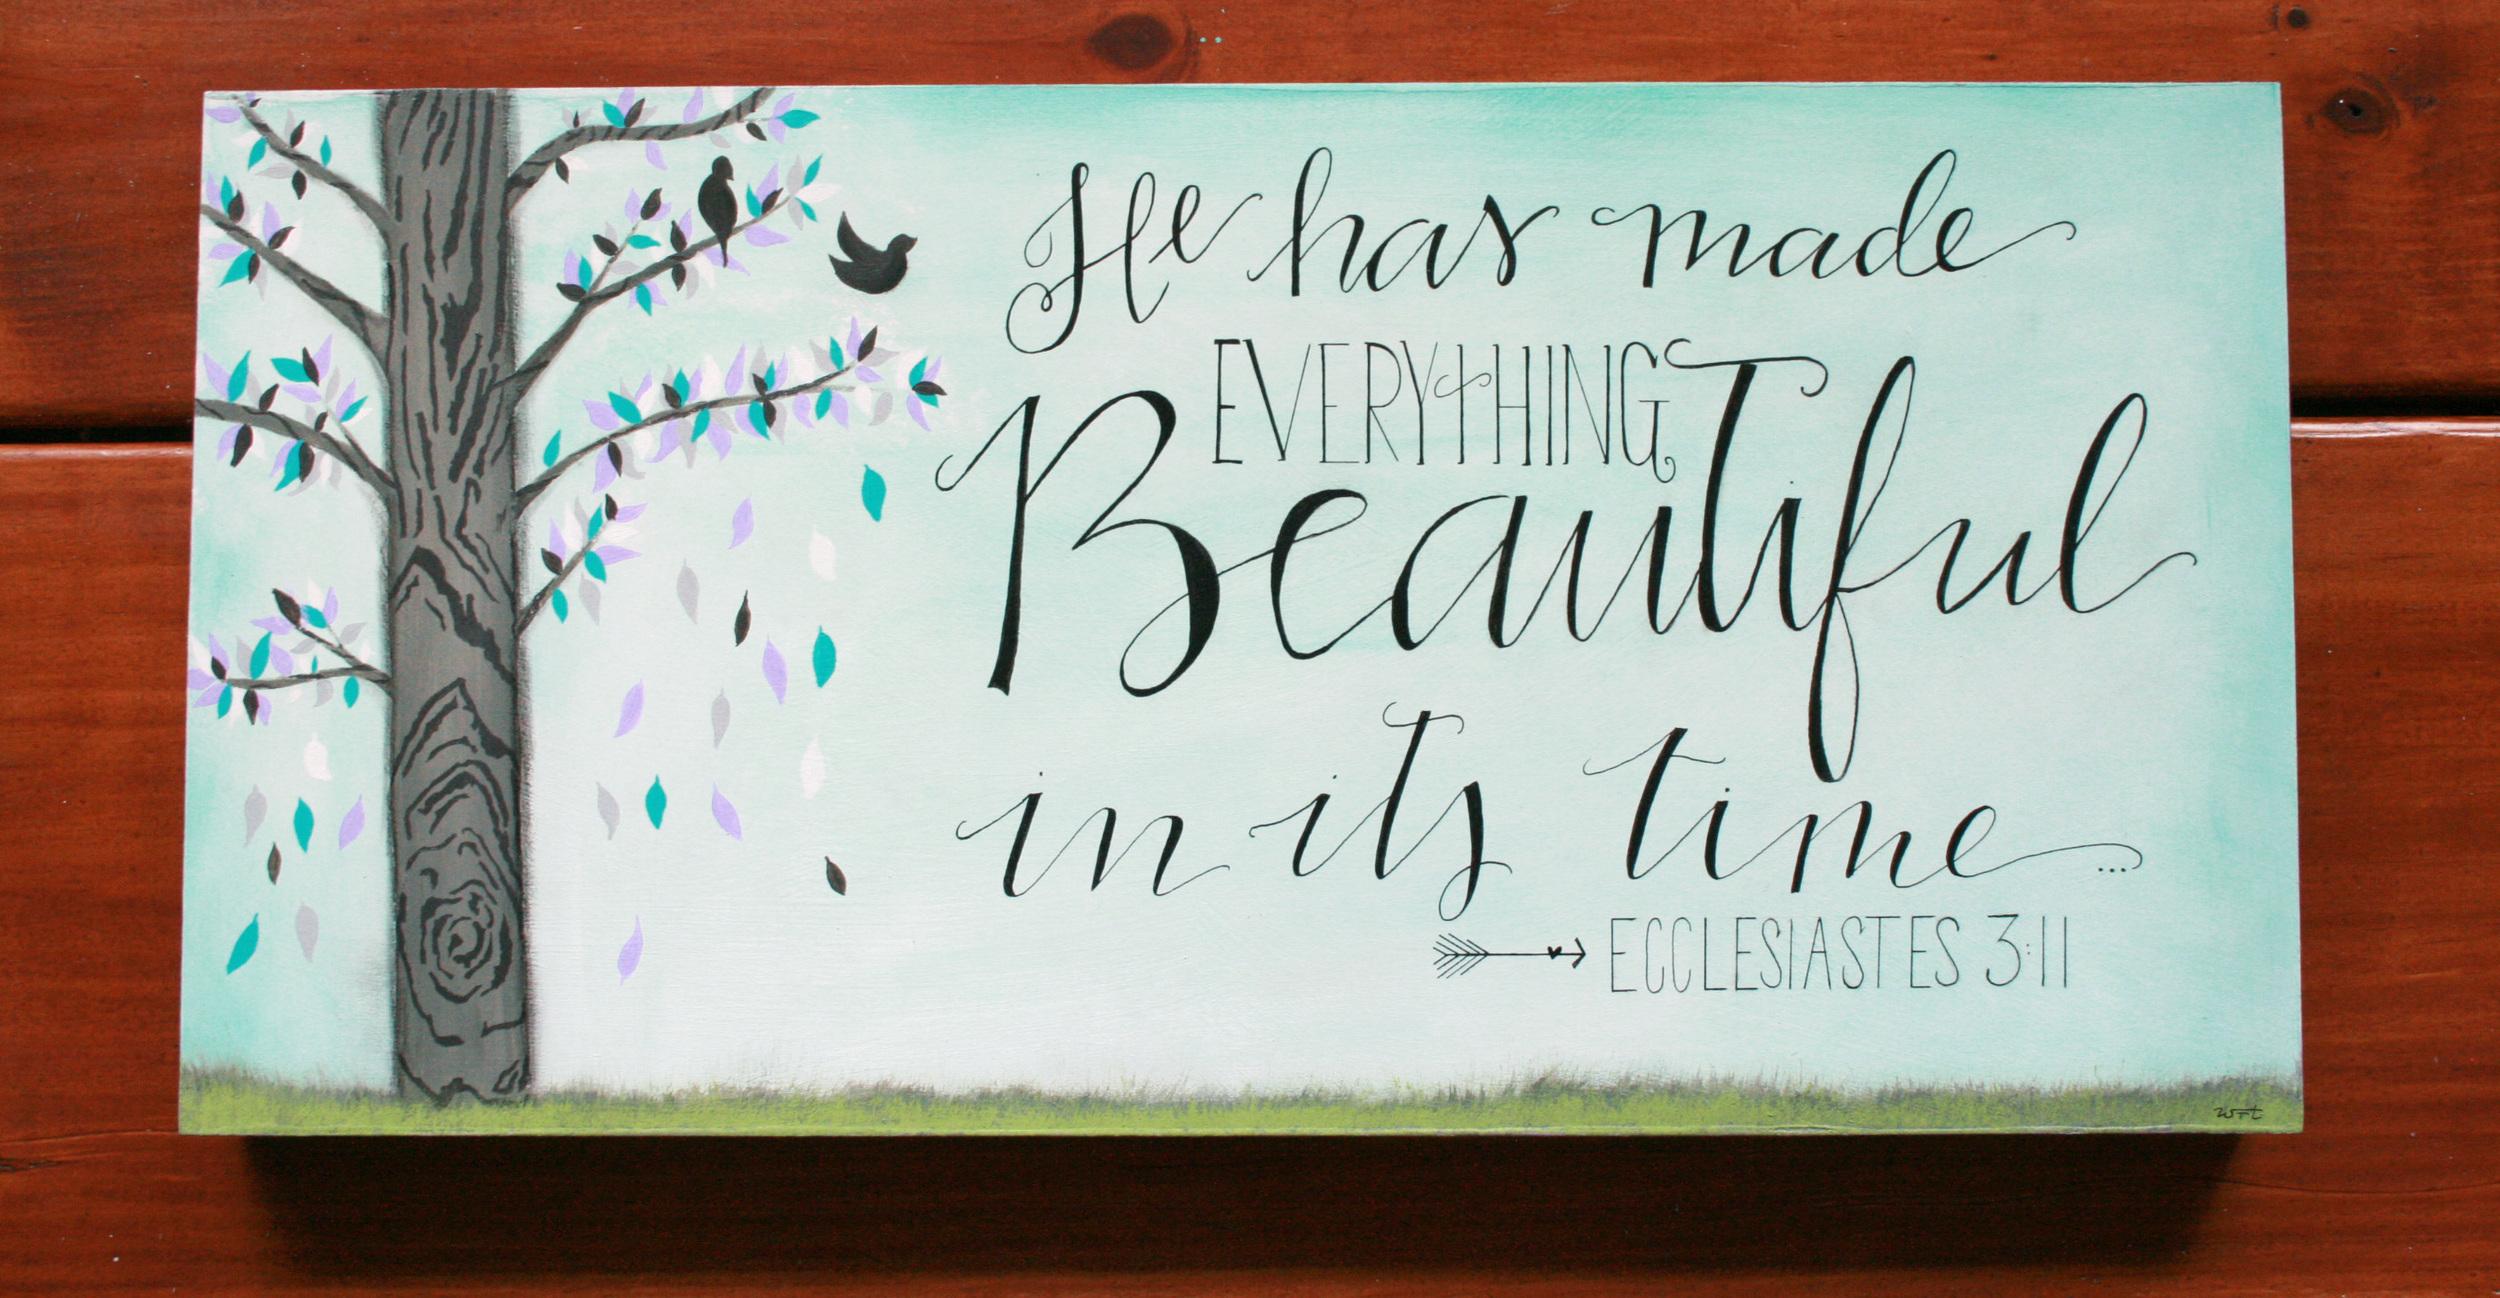 Ecclesiastes311_JitneysJourneys.jpg